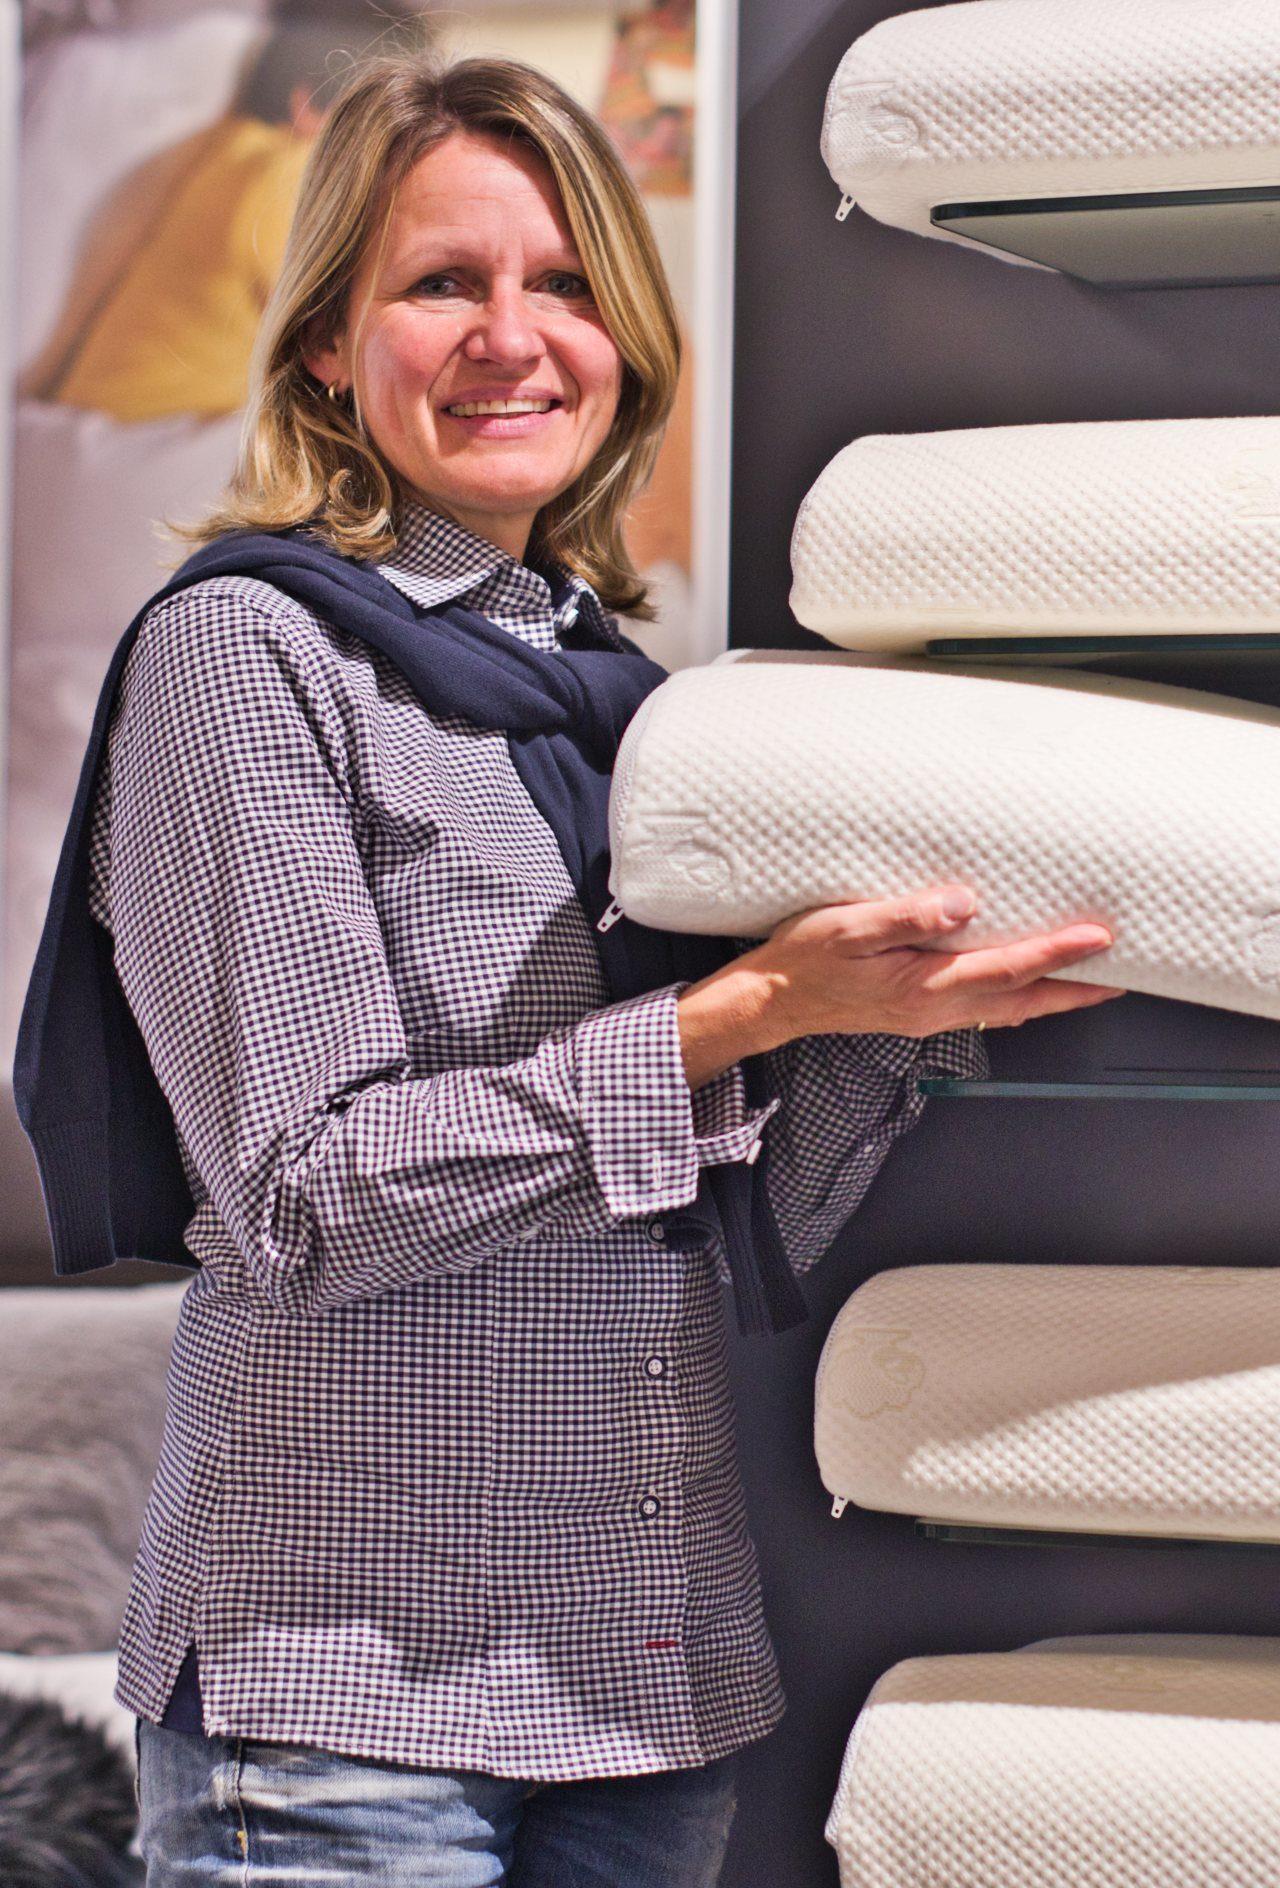 m ller schlafkultur betten matratzen bettdecken bettw sche. Black Bedroom Furniture Sets. Home Design Ideas